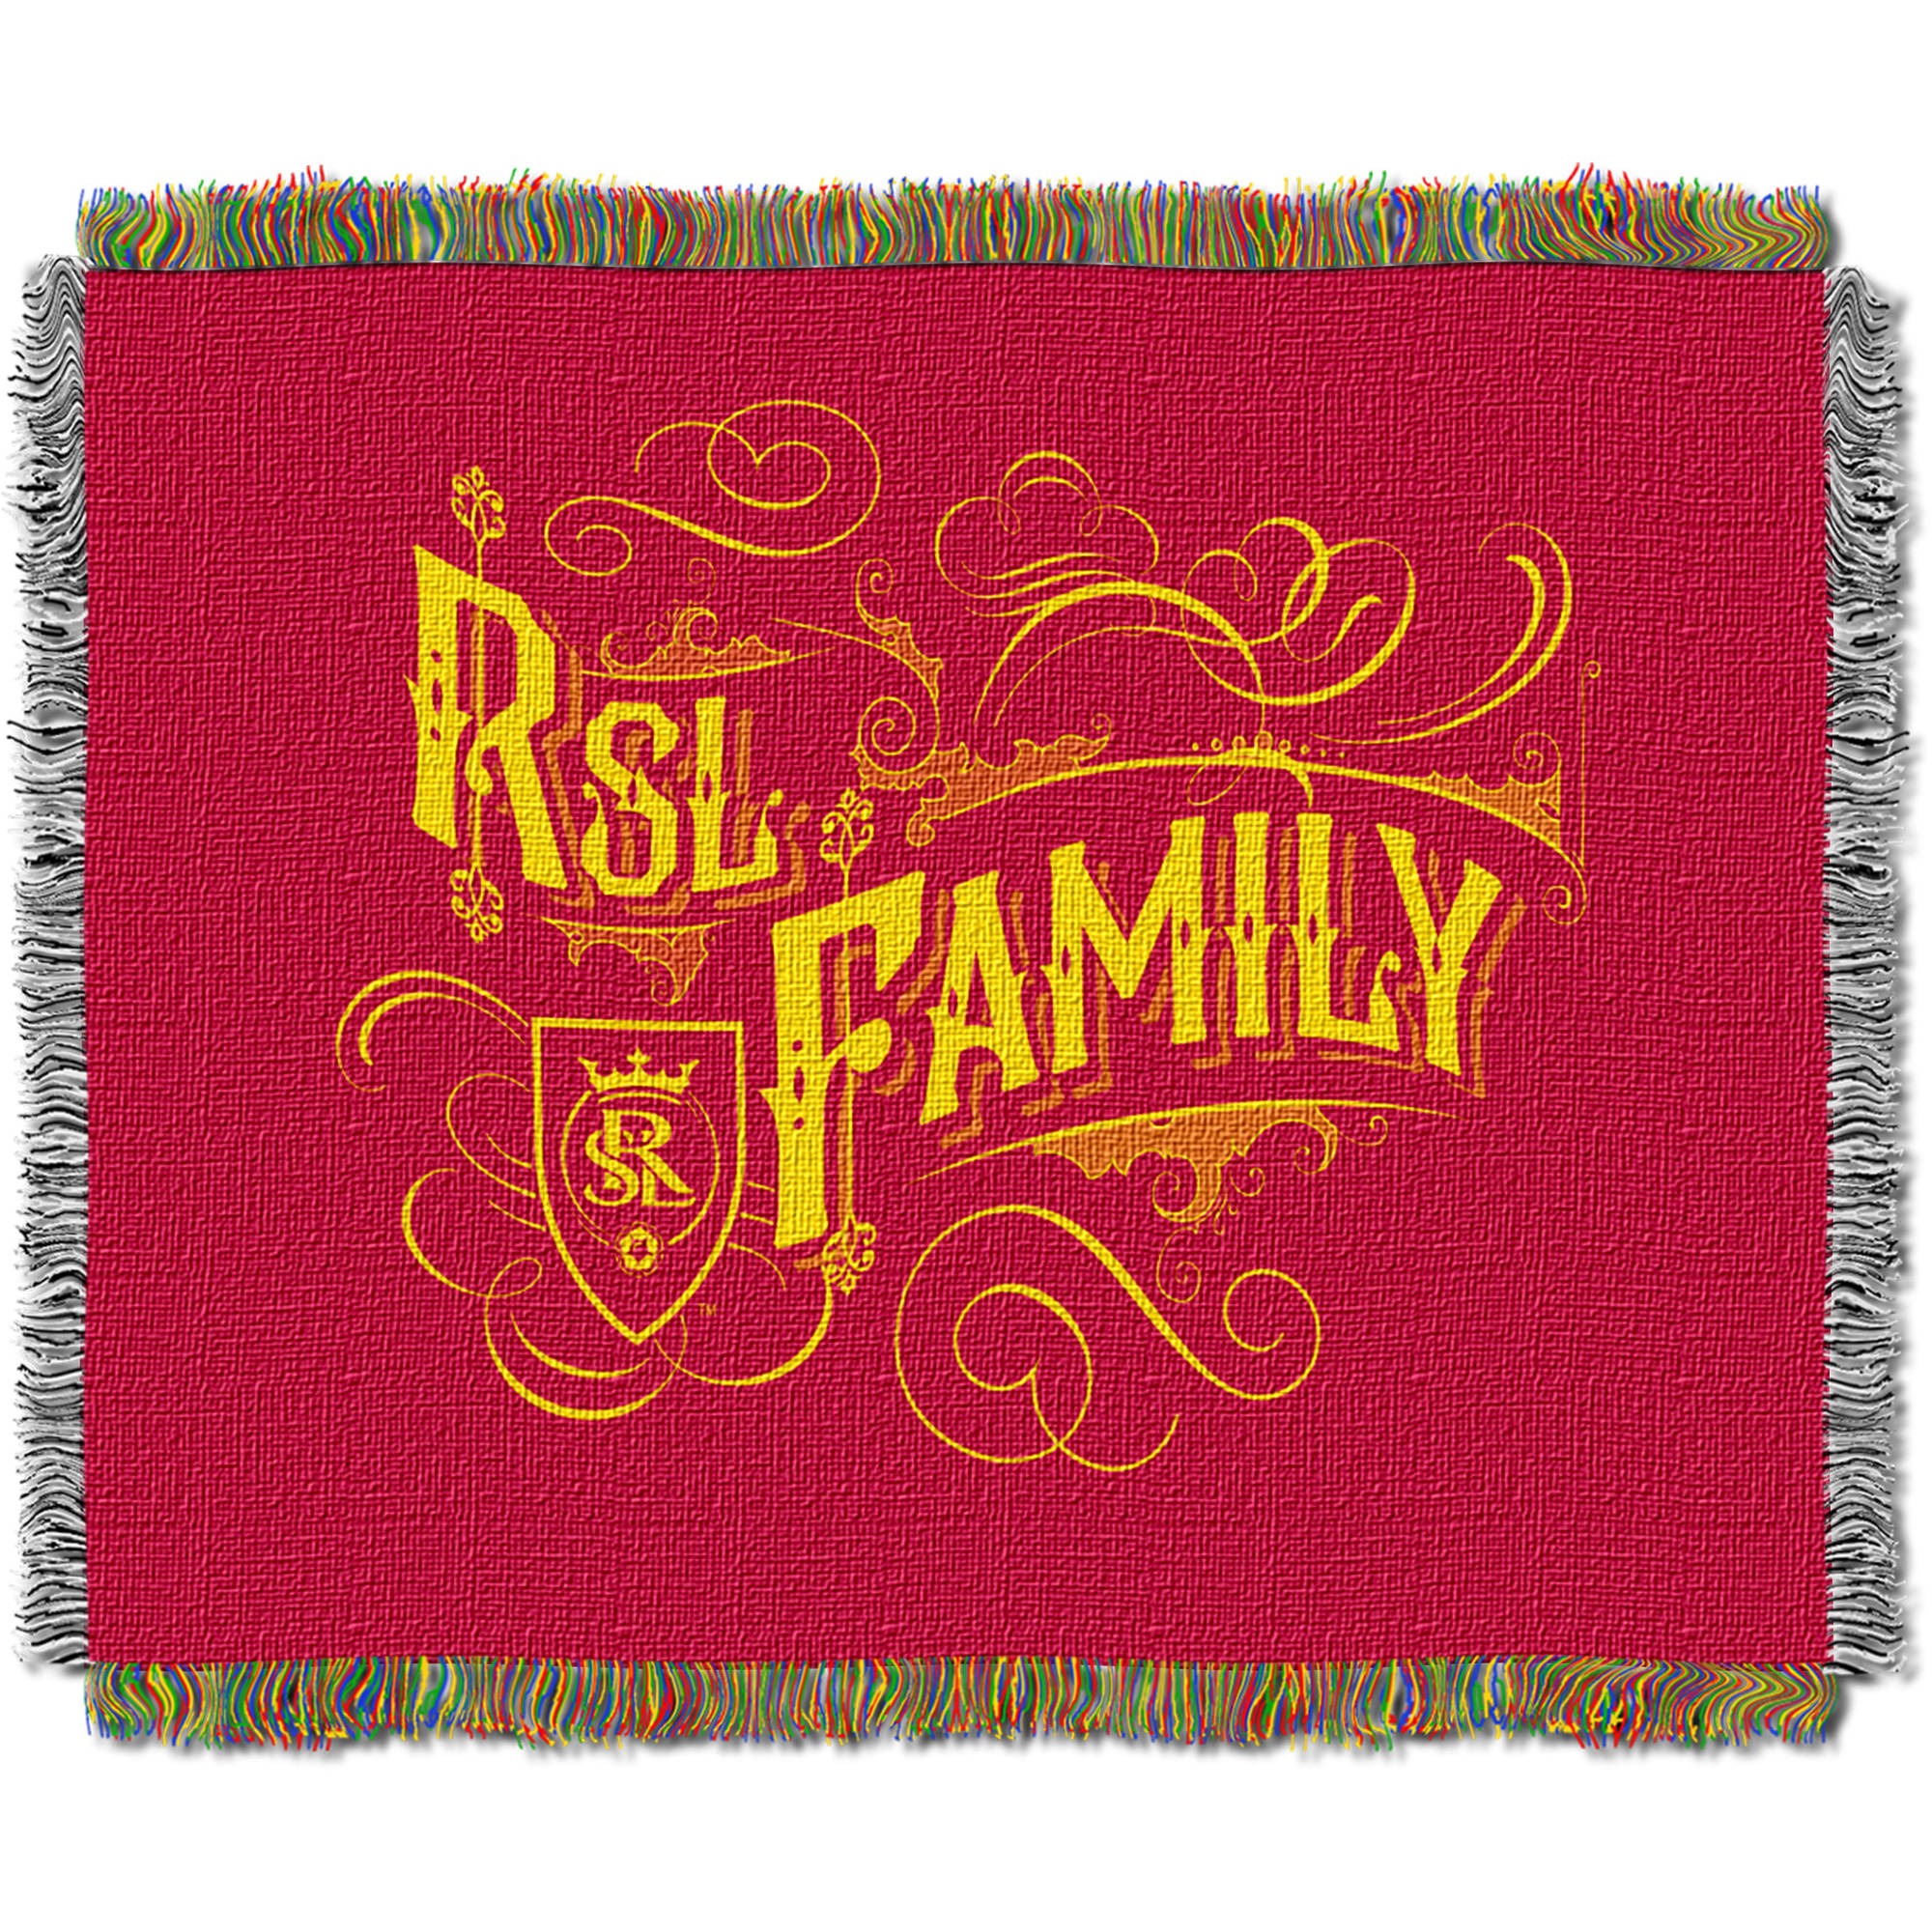 "MLS Real Salt Lake Handmade 48"" x 60"" Woven Tapestry Throw"